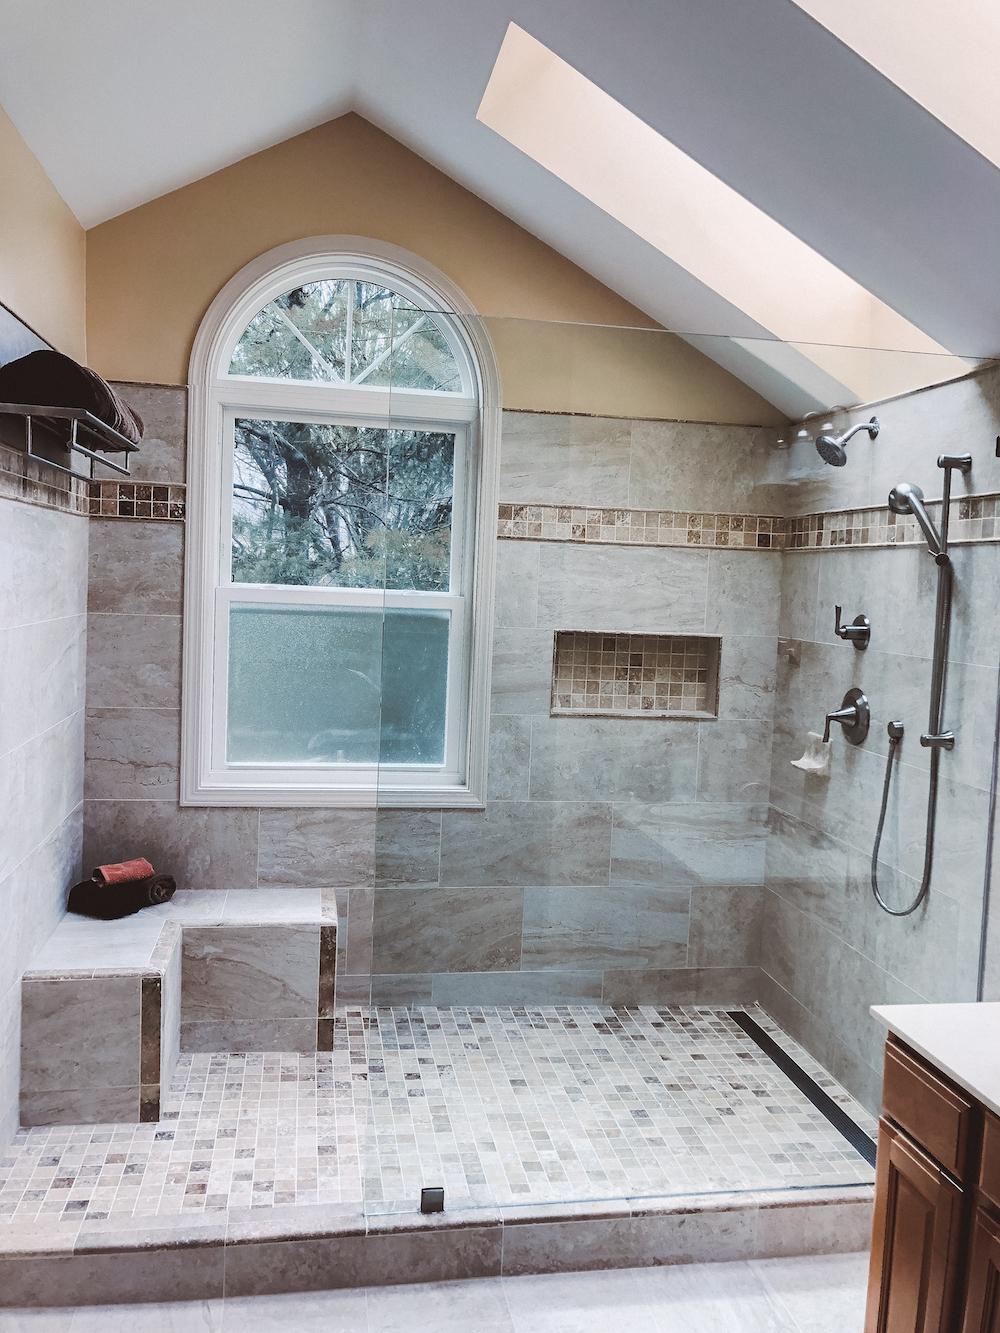 Bathroom renovation with skylight